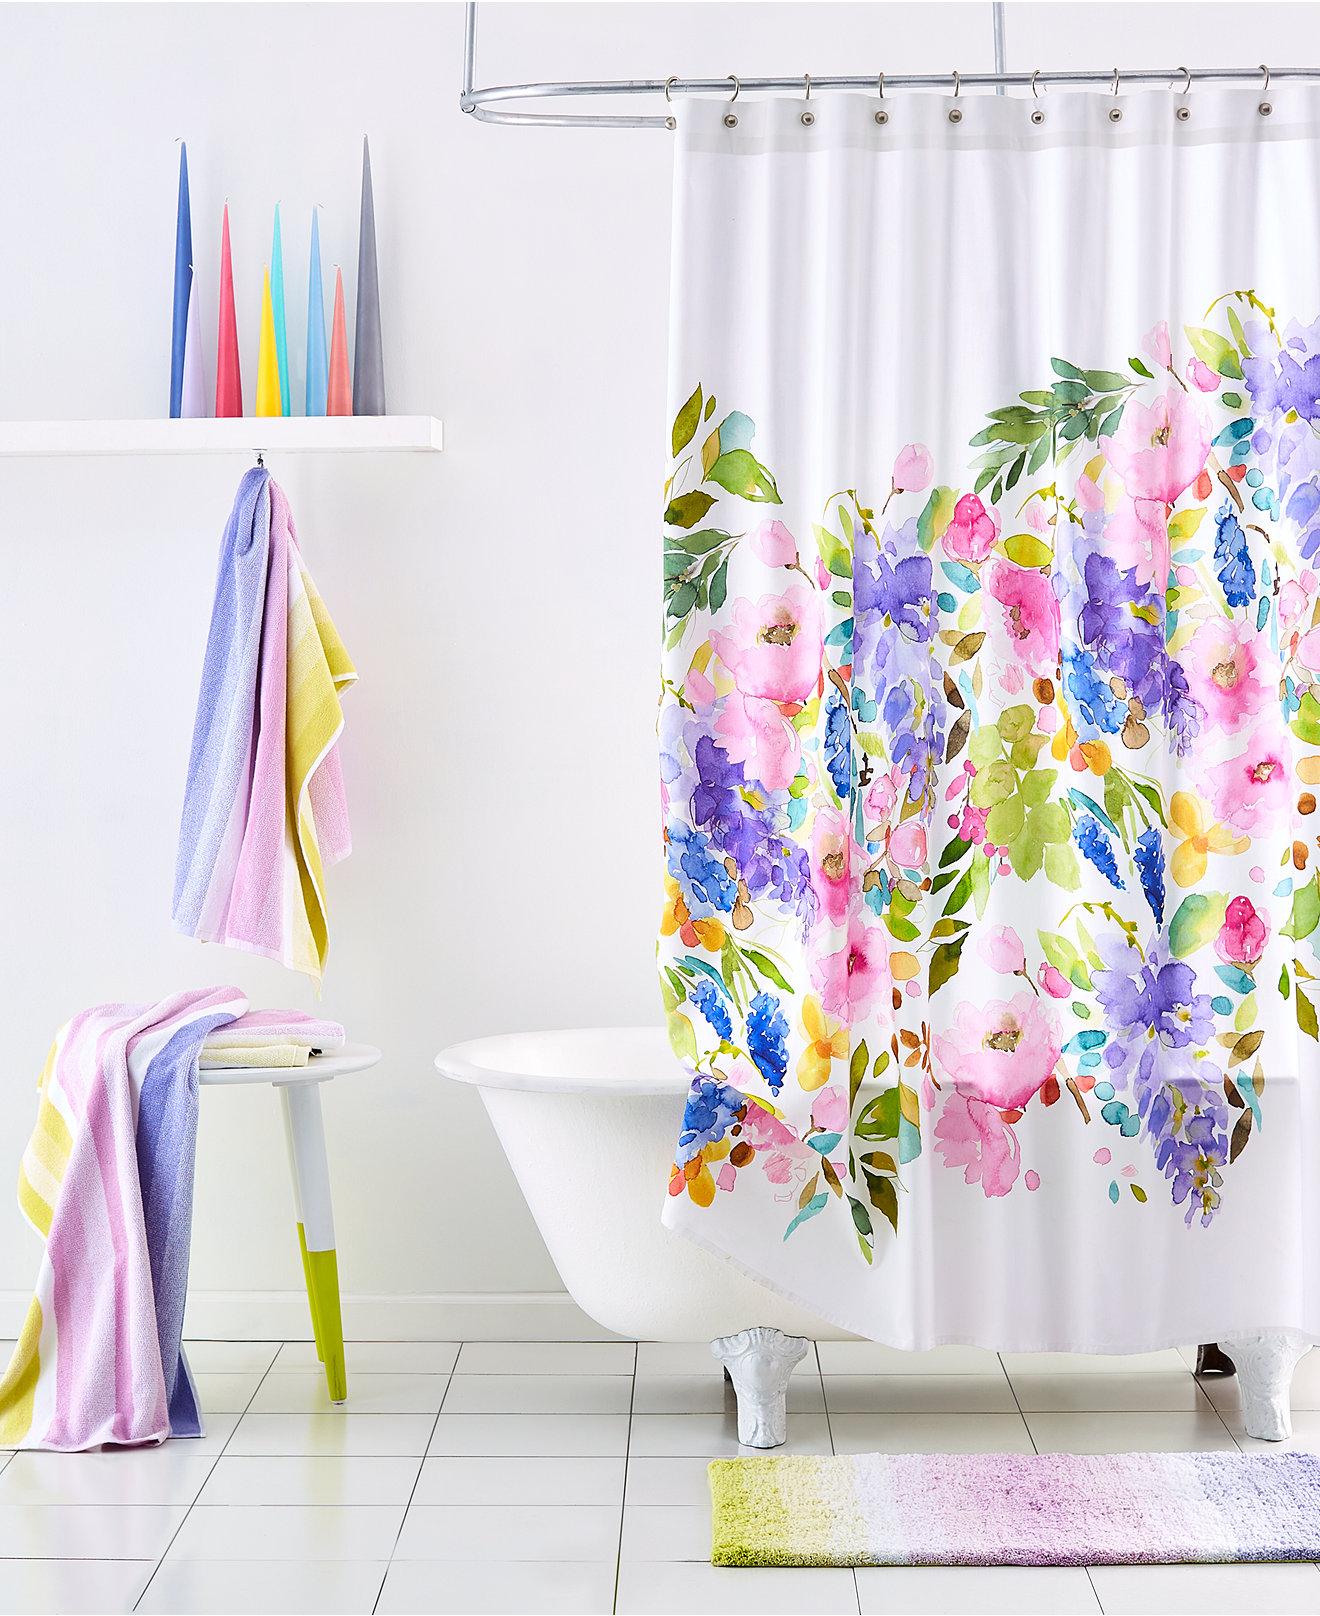 Vera bradley shower curtain - Bluebellgray Wisteria Bath Collection